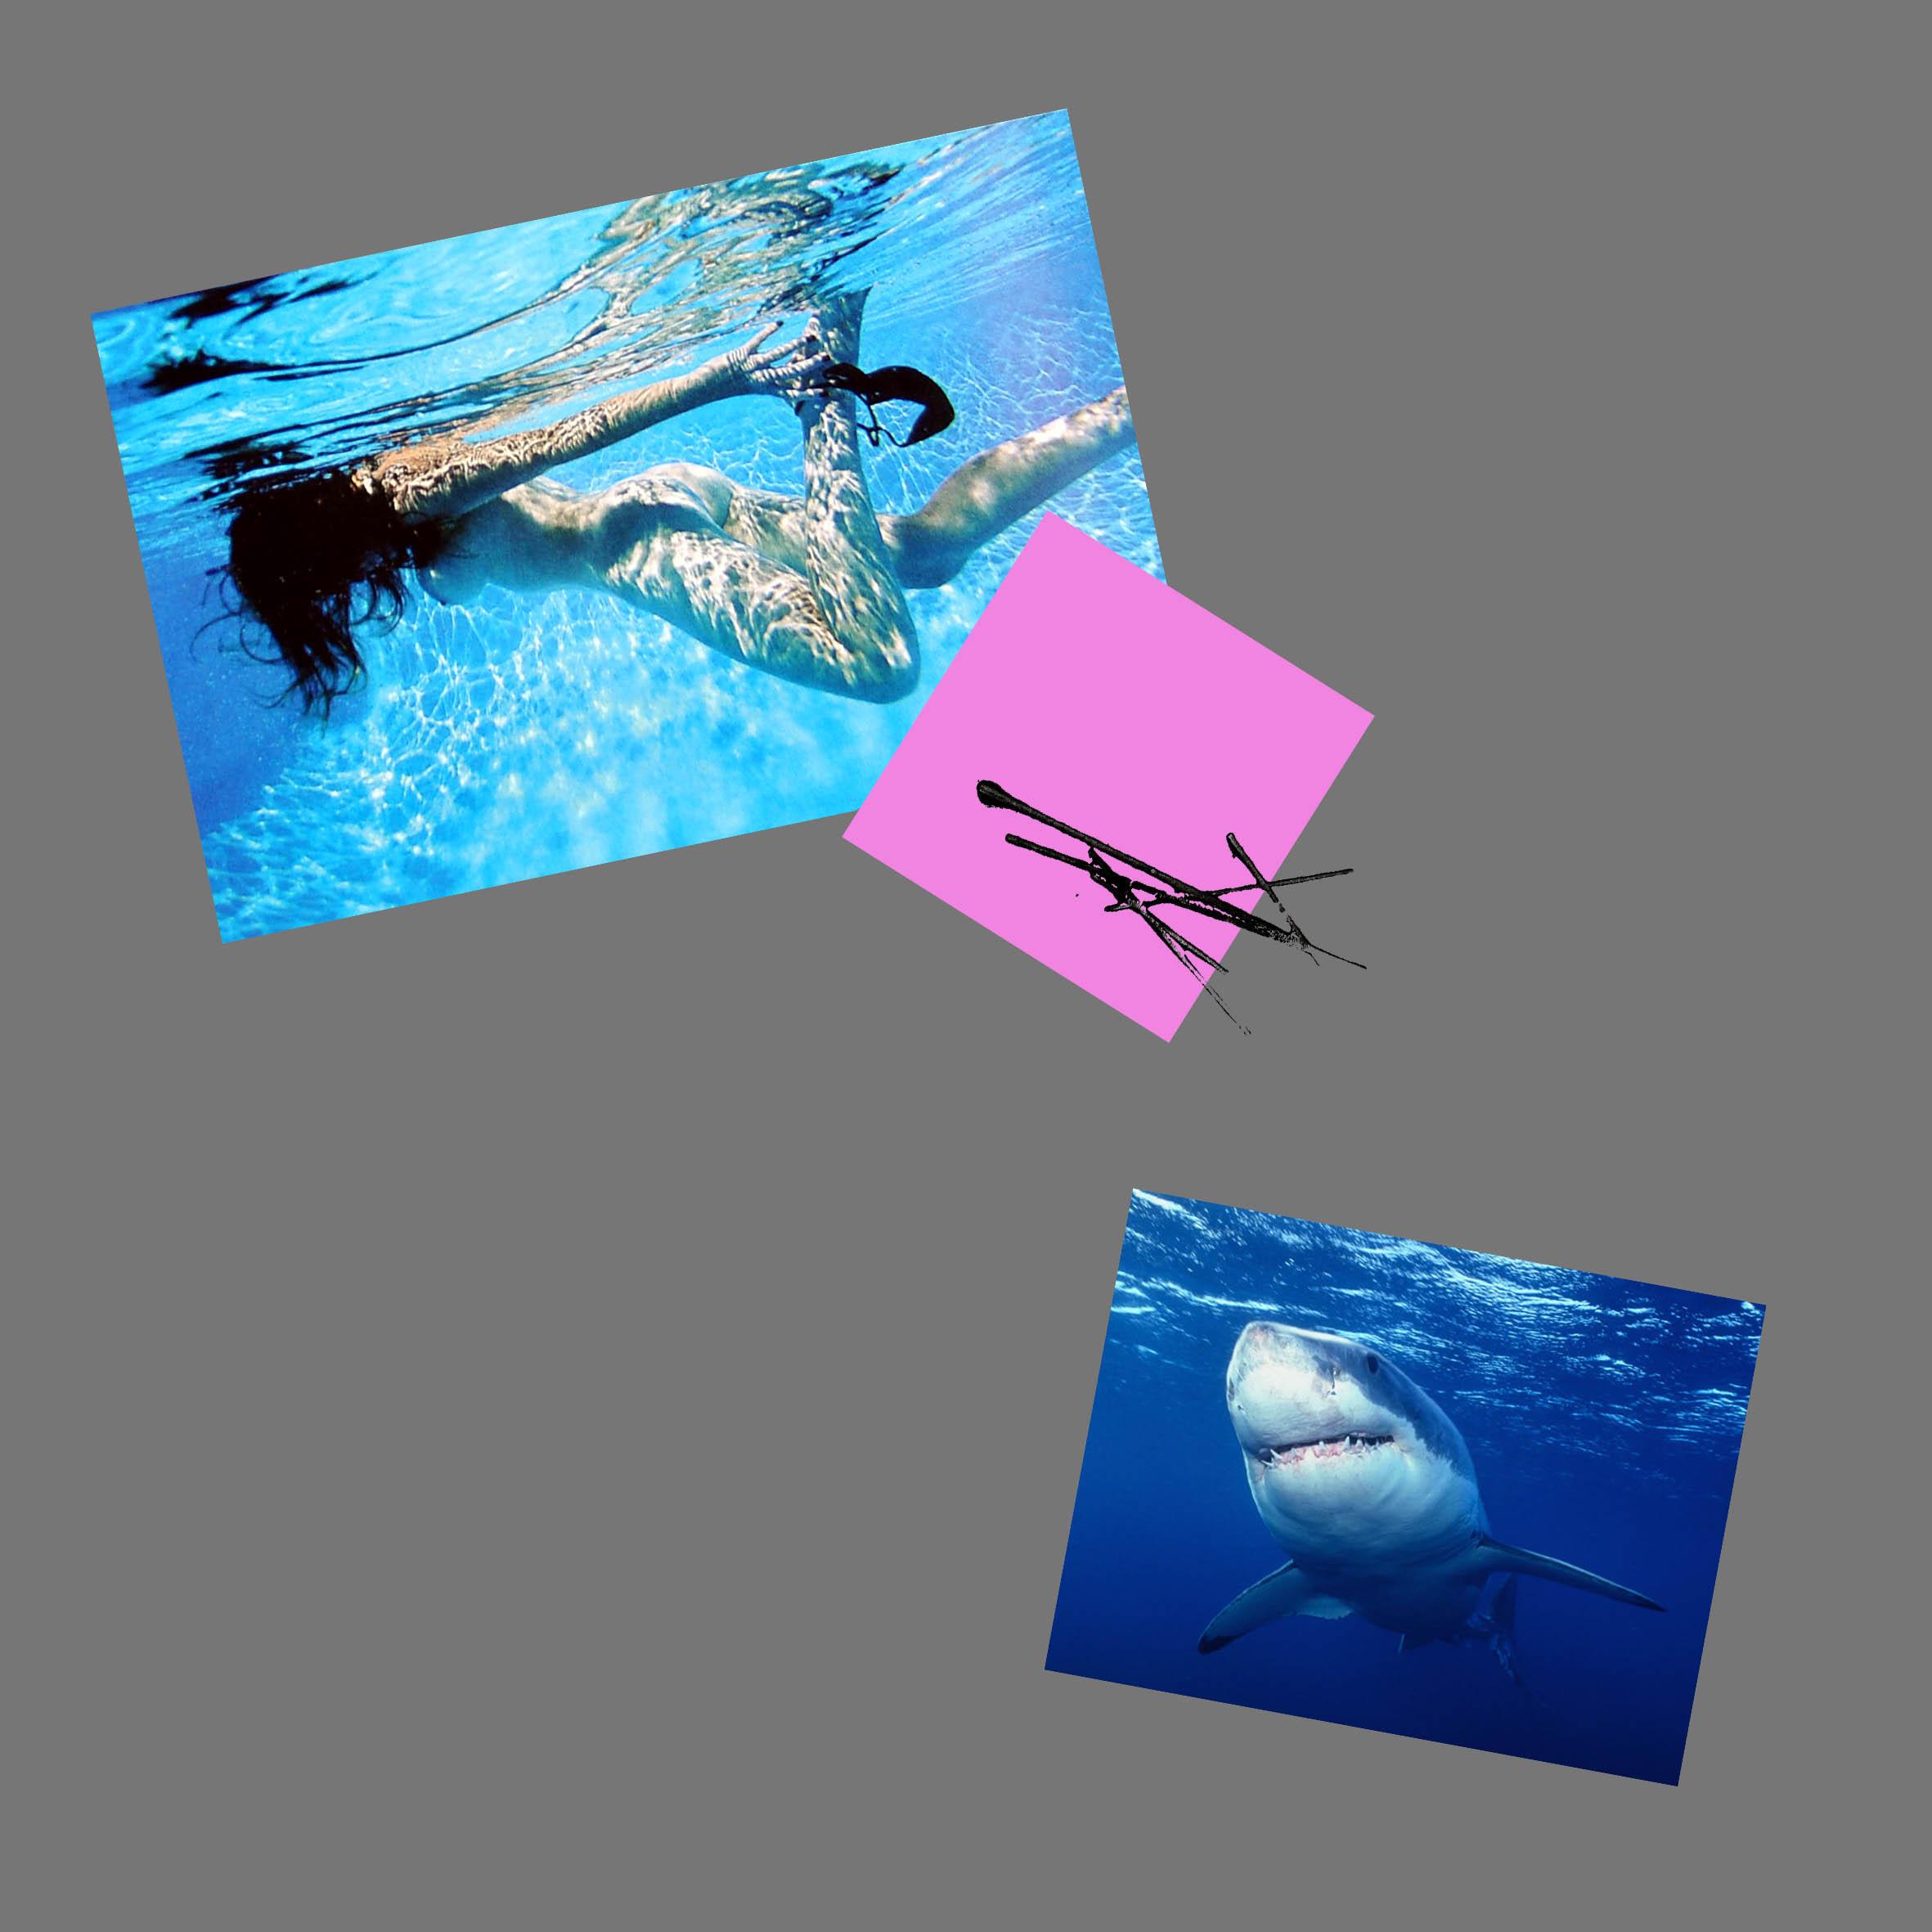 Destini incrociati, 2015, Digital   fine art e timbri su tela, cm 60x60